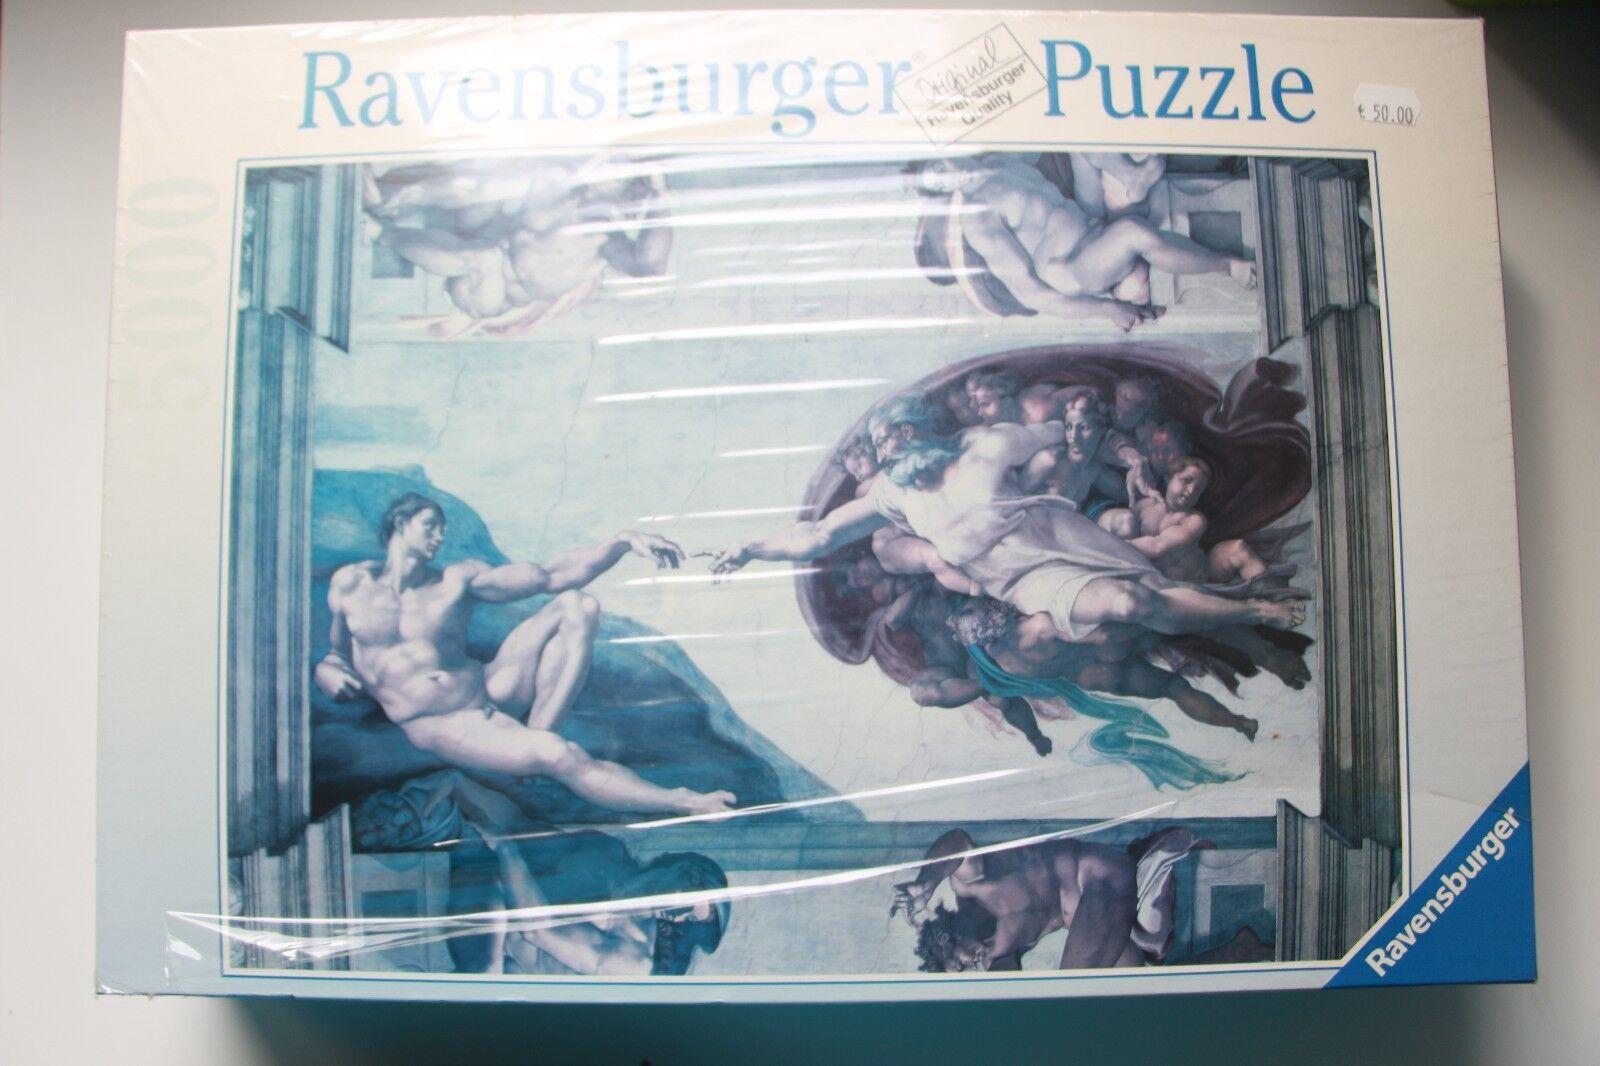 RAVENSBURGER PUZZLE 174089 174089 174089 CREATION OF ADAM NEW  YEAR 2004 IN SEALED BOX 8cbd1c